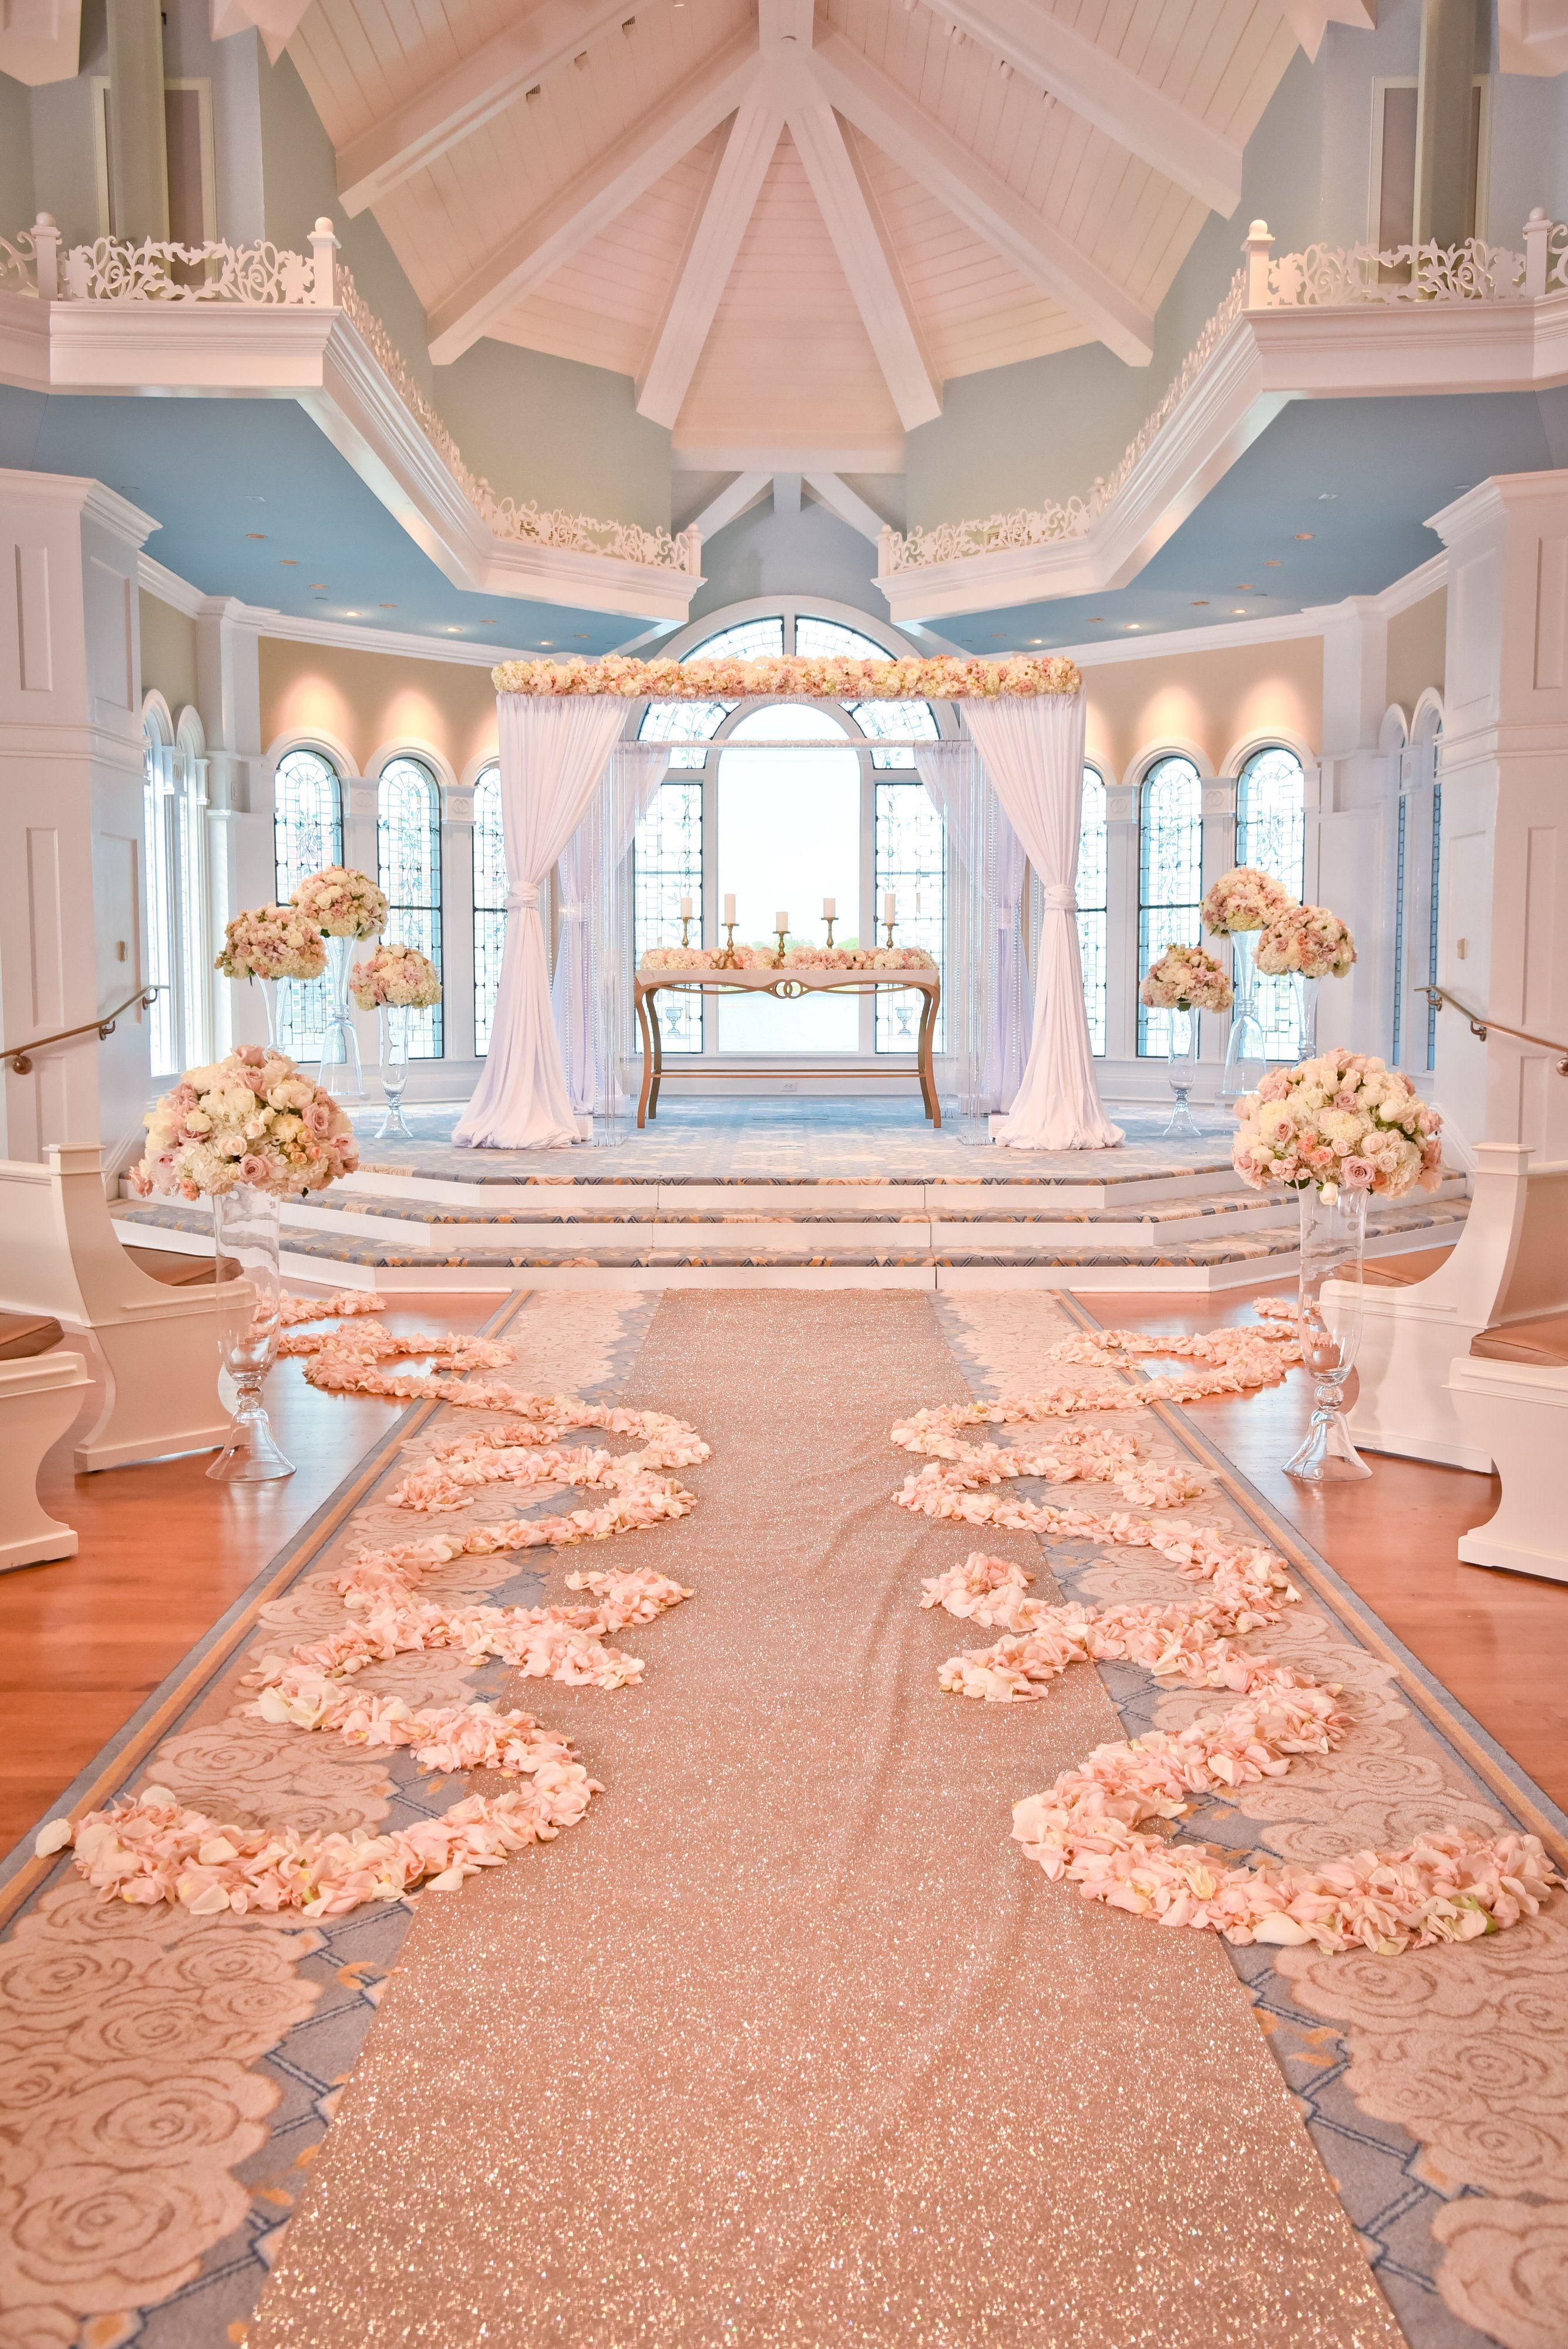 Decor look from the Disney's Fairy Tale Weddings TV Show ...